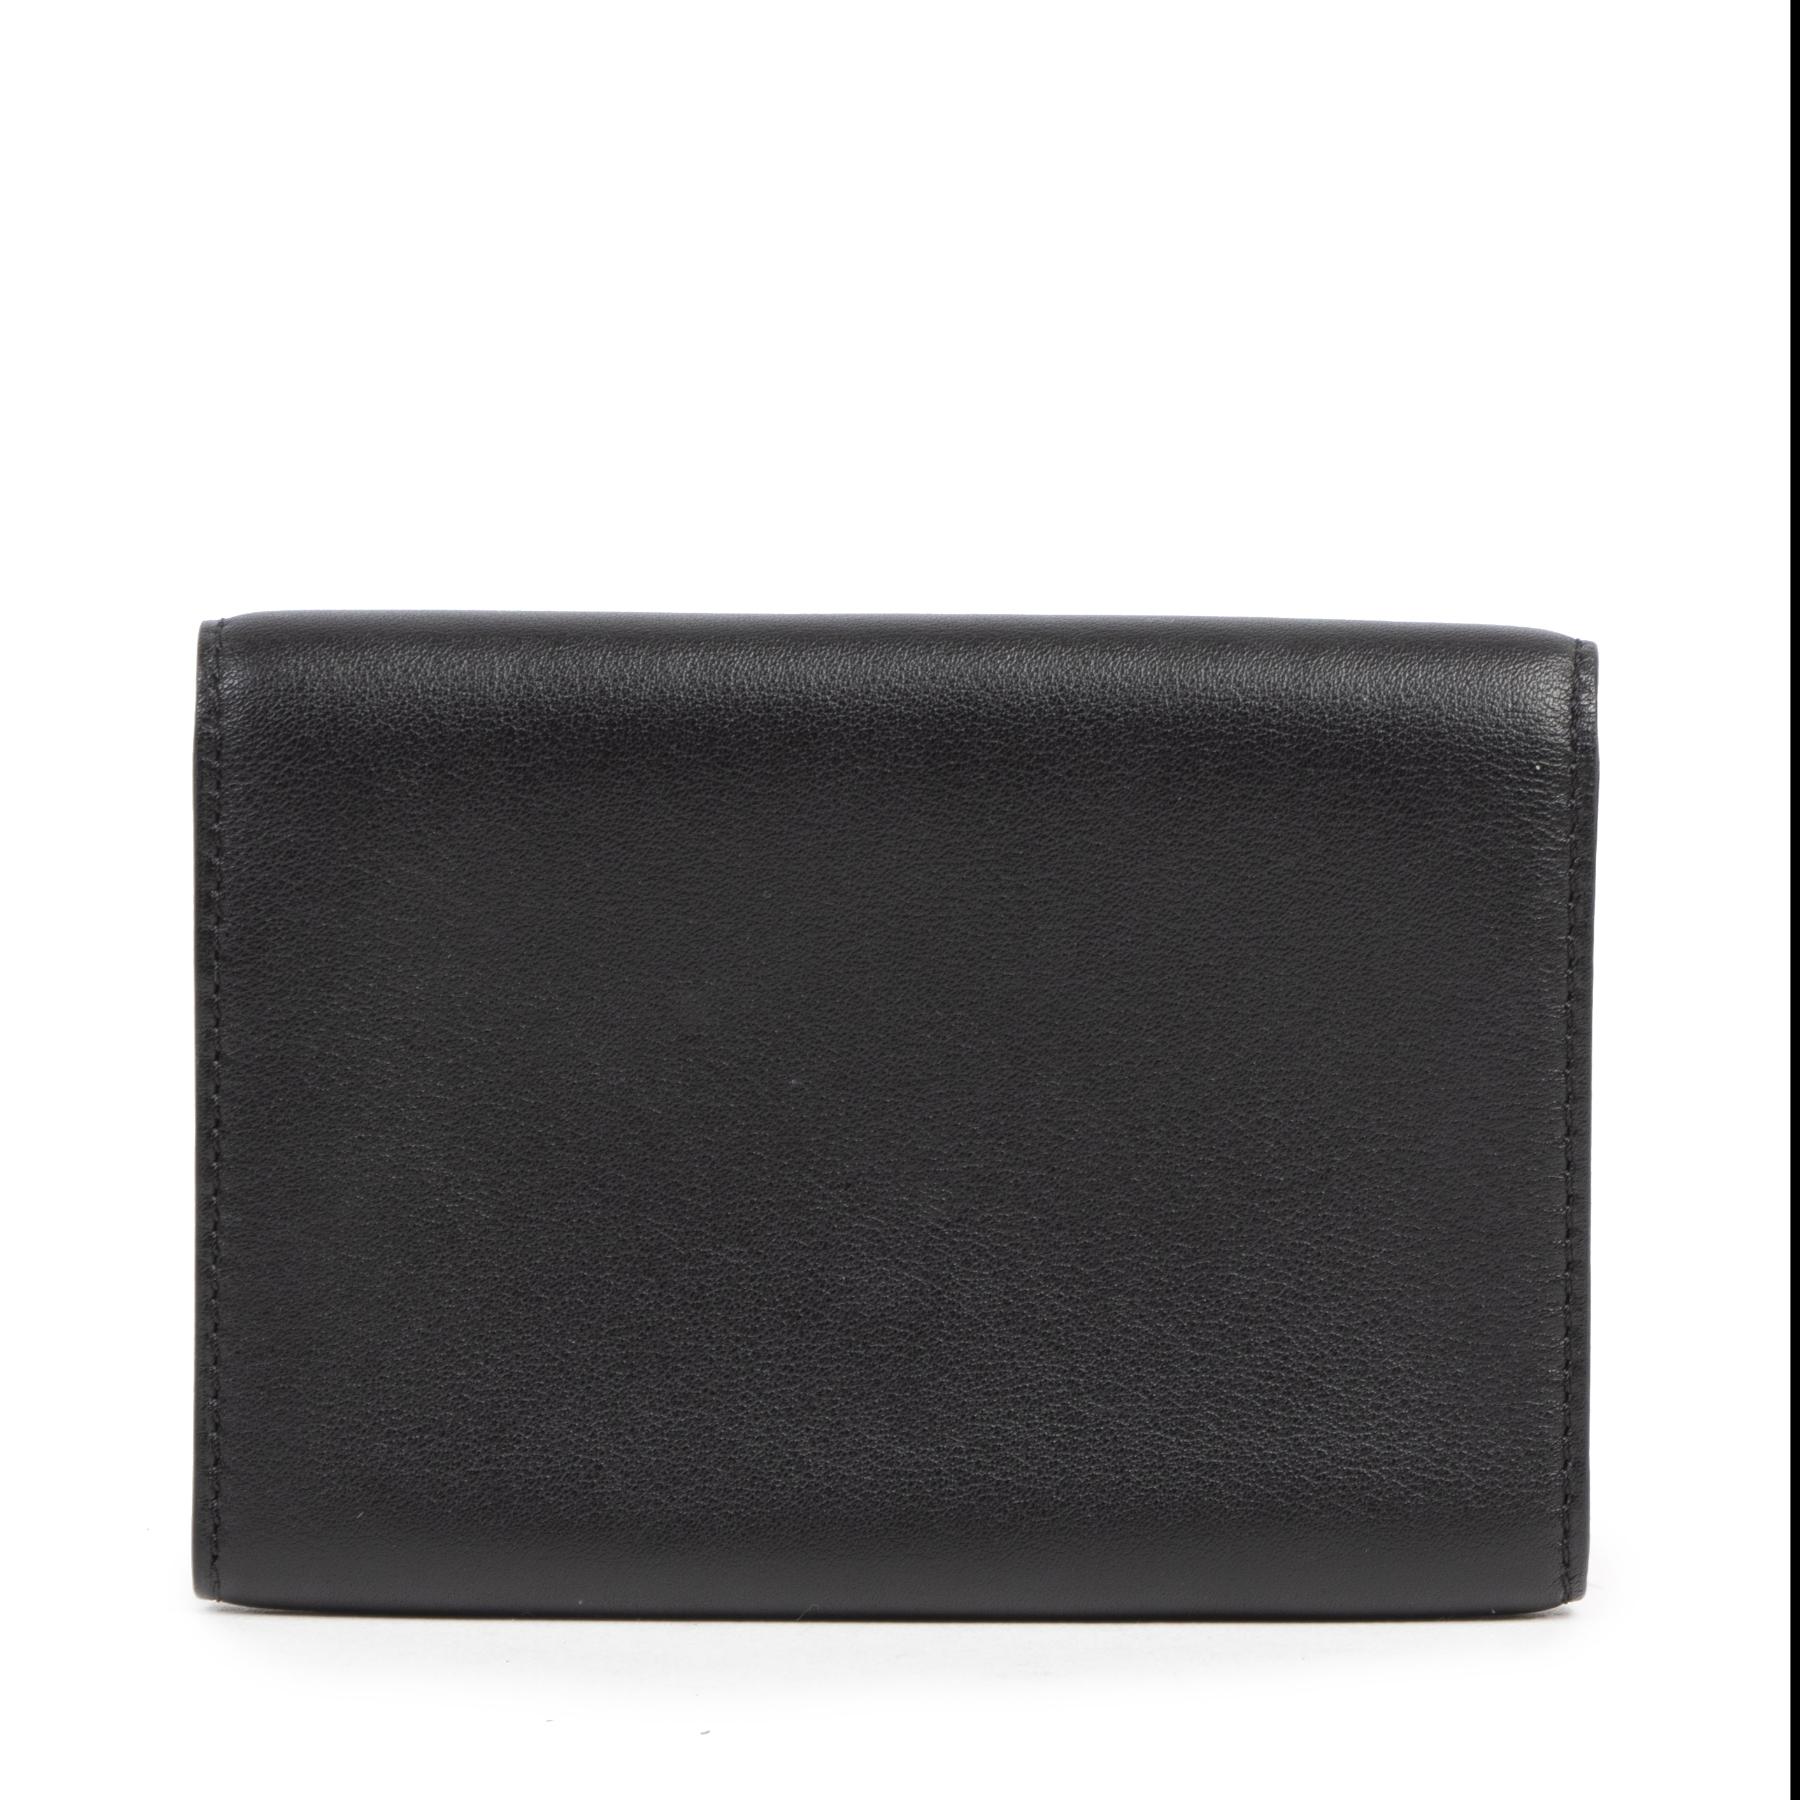 Authentieke tweedehands vintage Delvaux Black Leather Card Holder bij online webshop LabelLOV